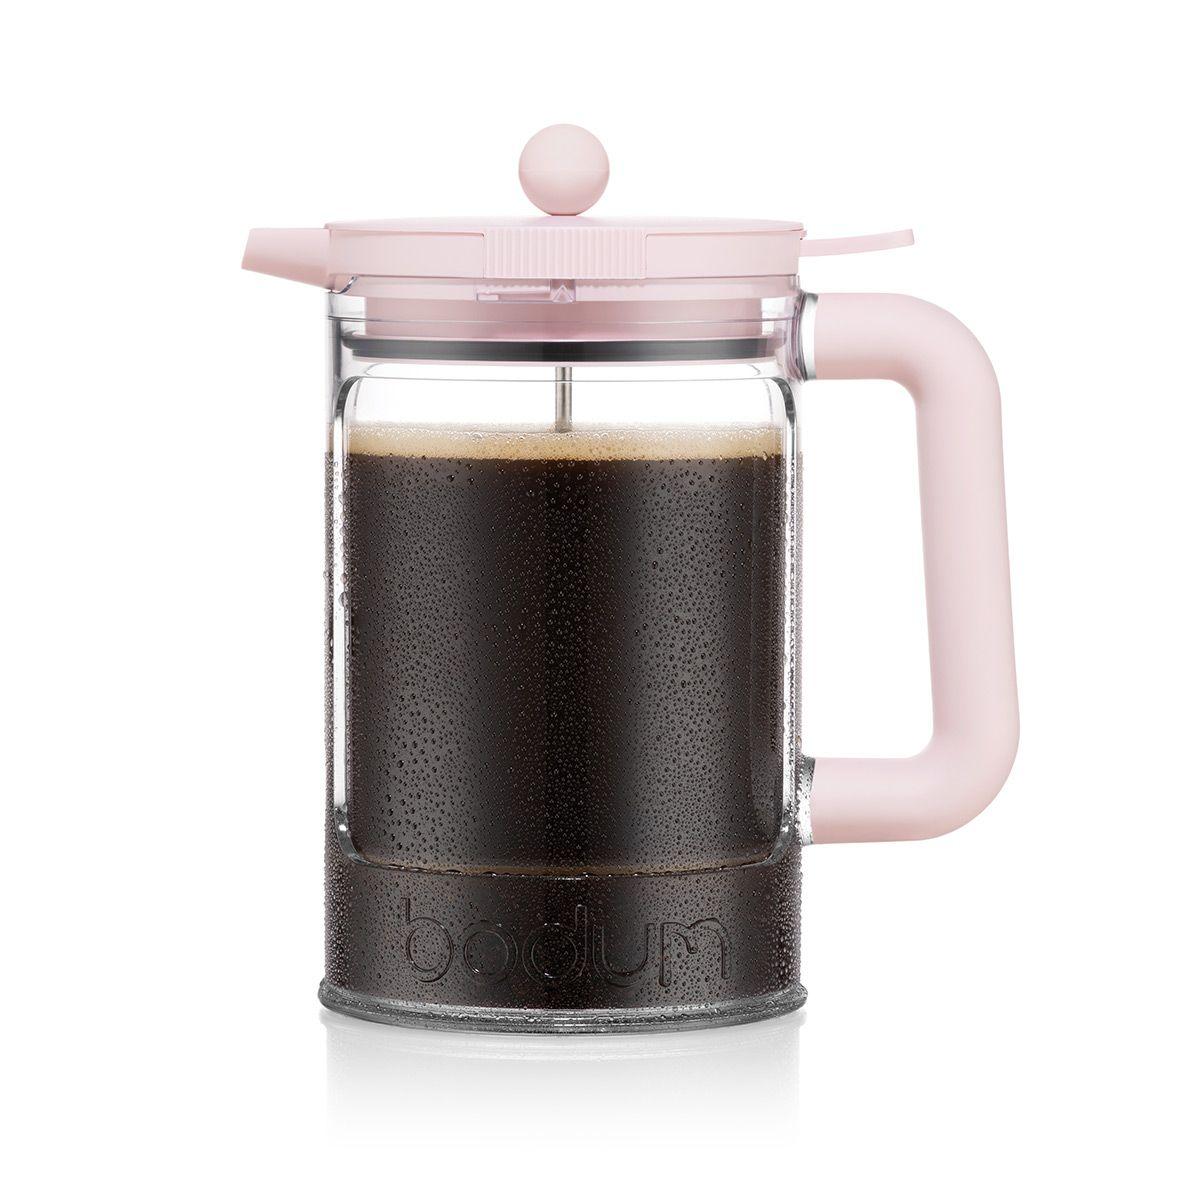 Cold coffee brewer Bodum